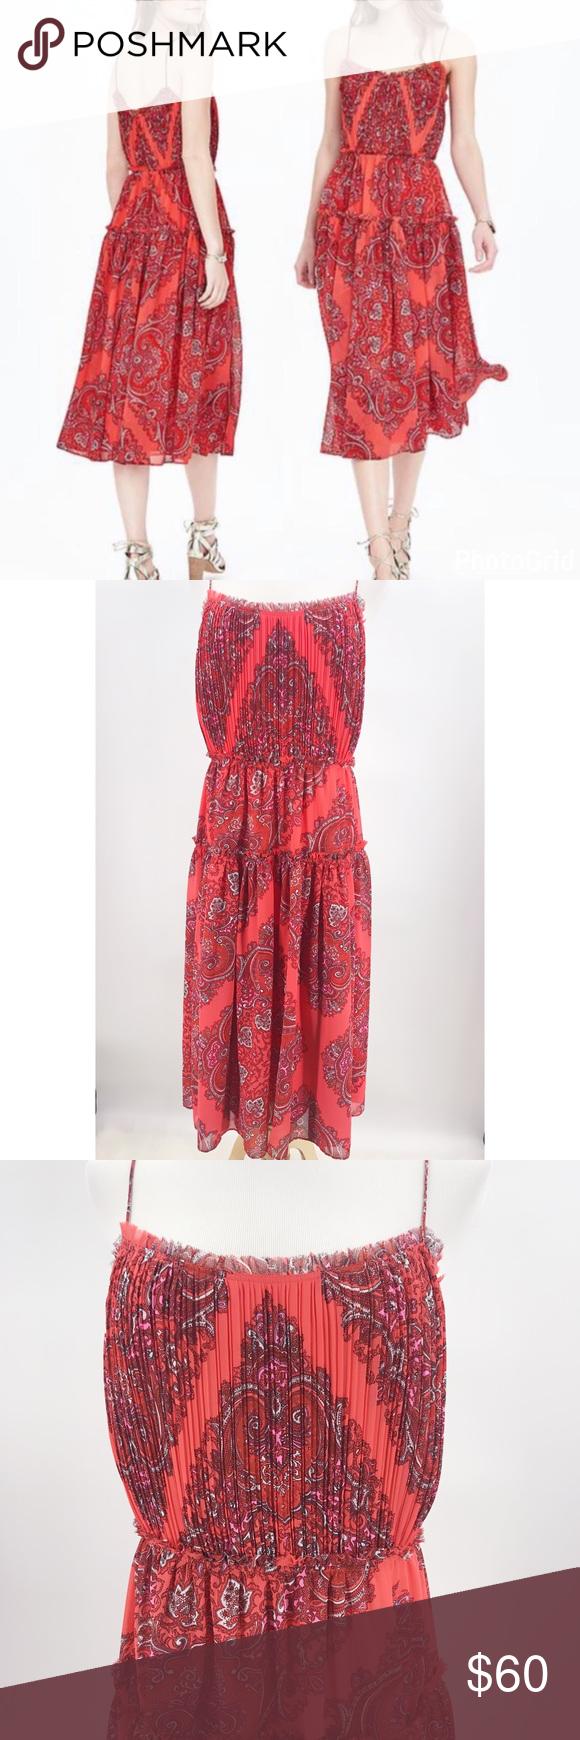 d091469dba Banana Republic Paisley Gathered Maxi Dress